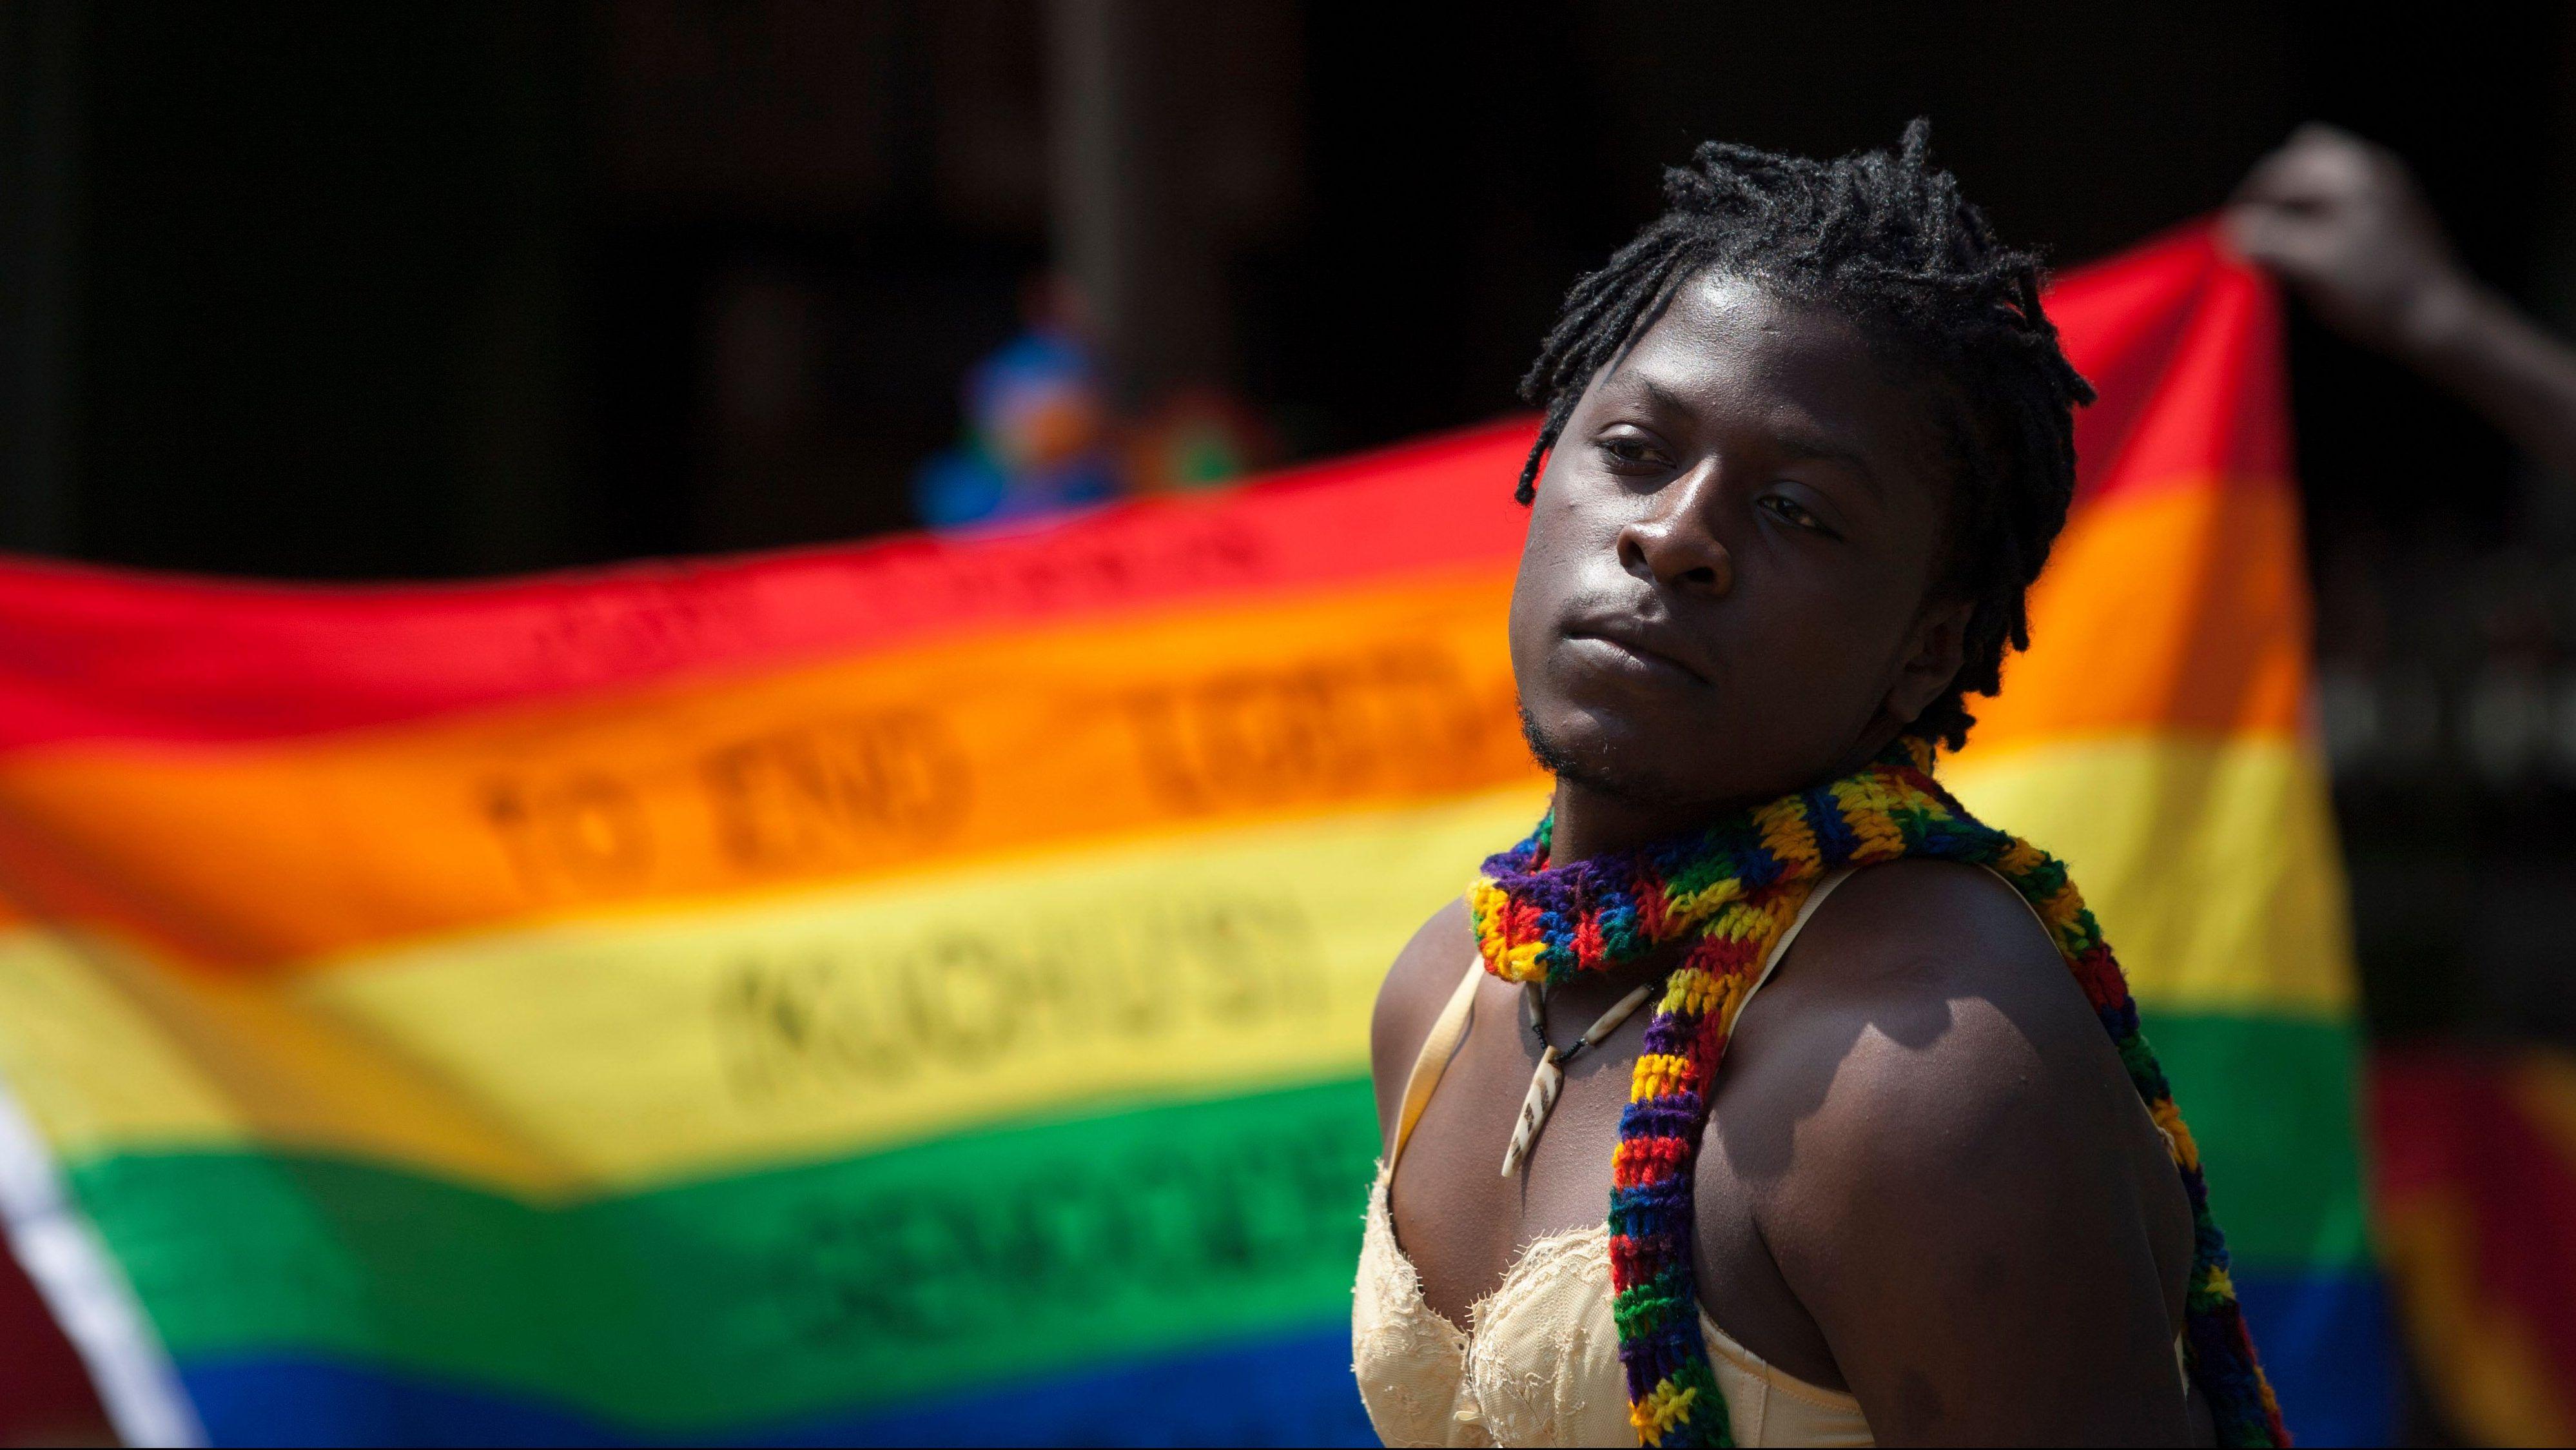 Trinidad & Tobago'da İlk Onur Yürüyüşü